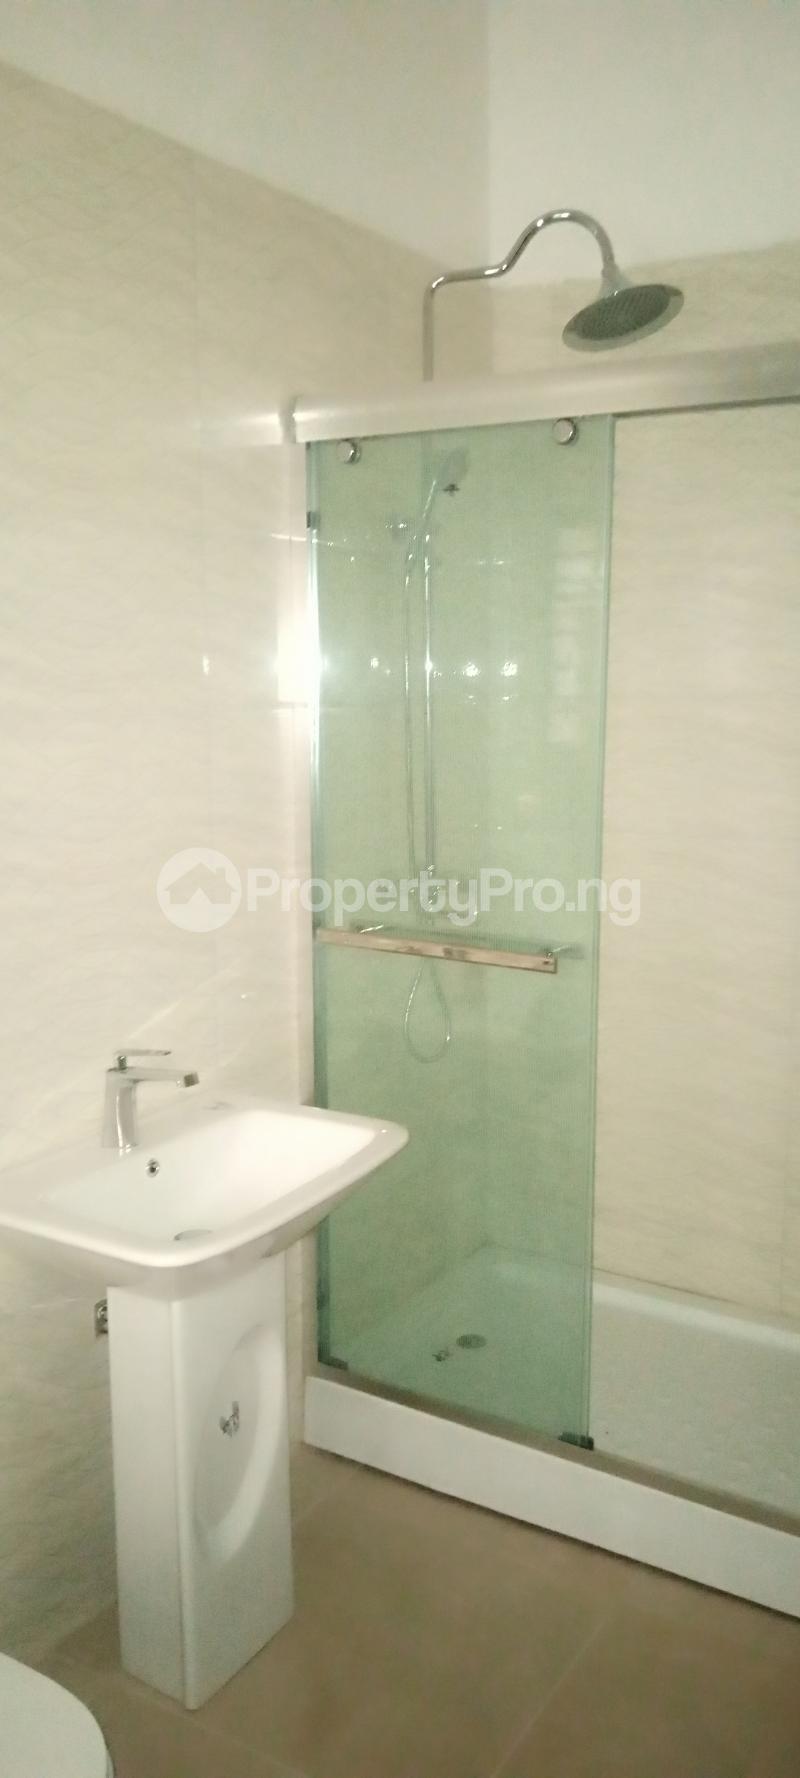 5 bedroom Detached Duplex House for sale Estate drive Omole phase 1 Ojodu Lagos - 11